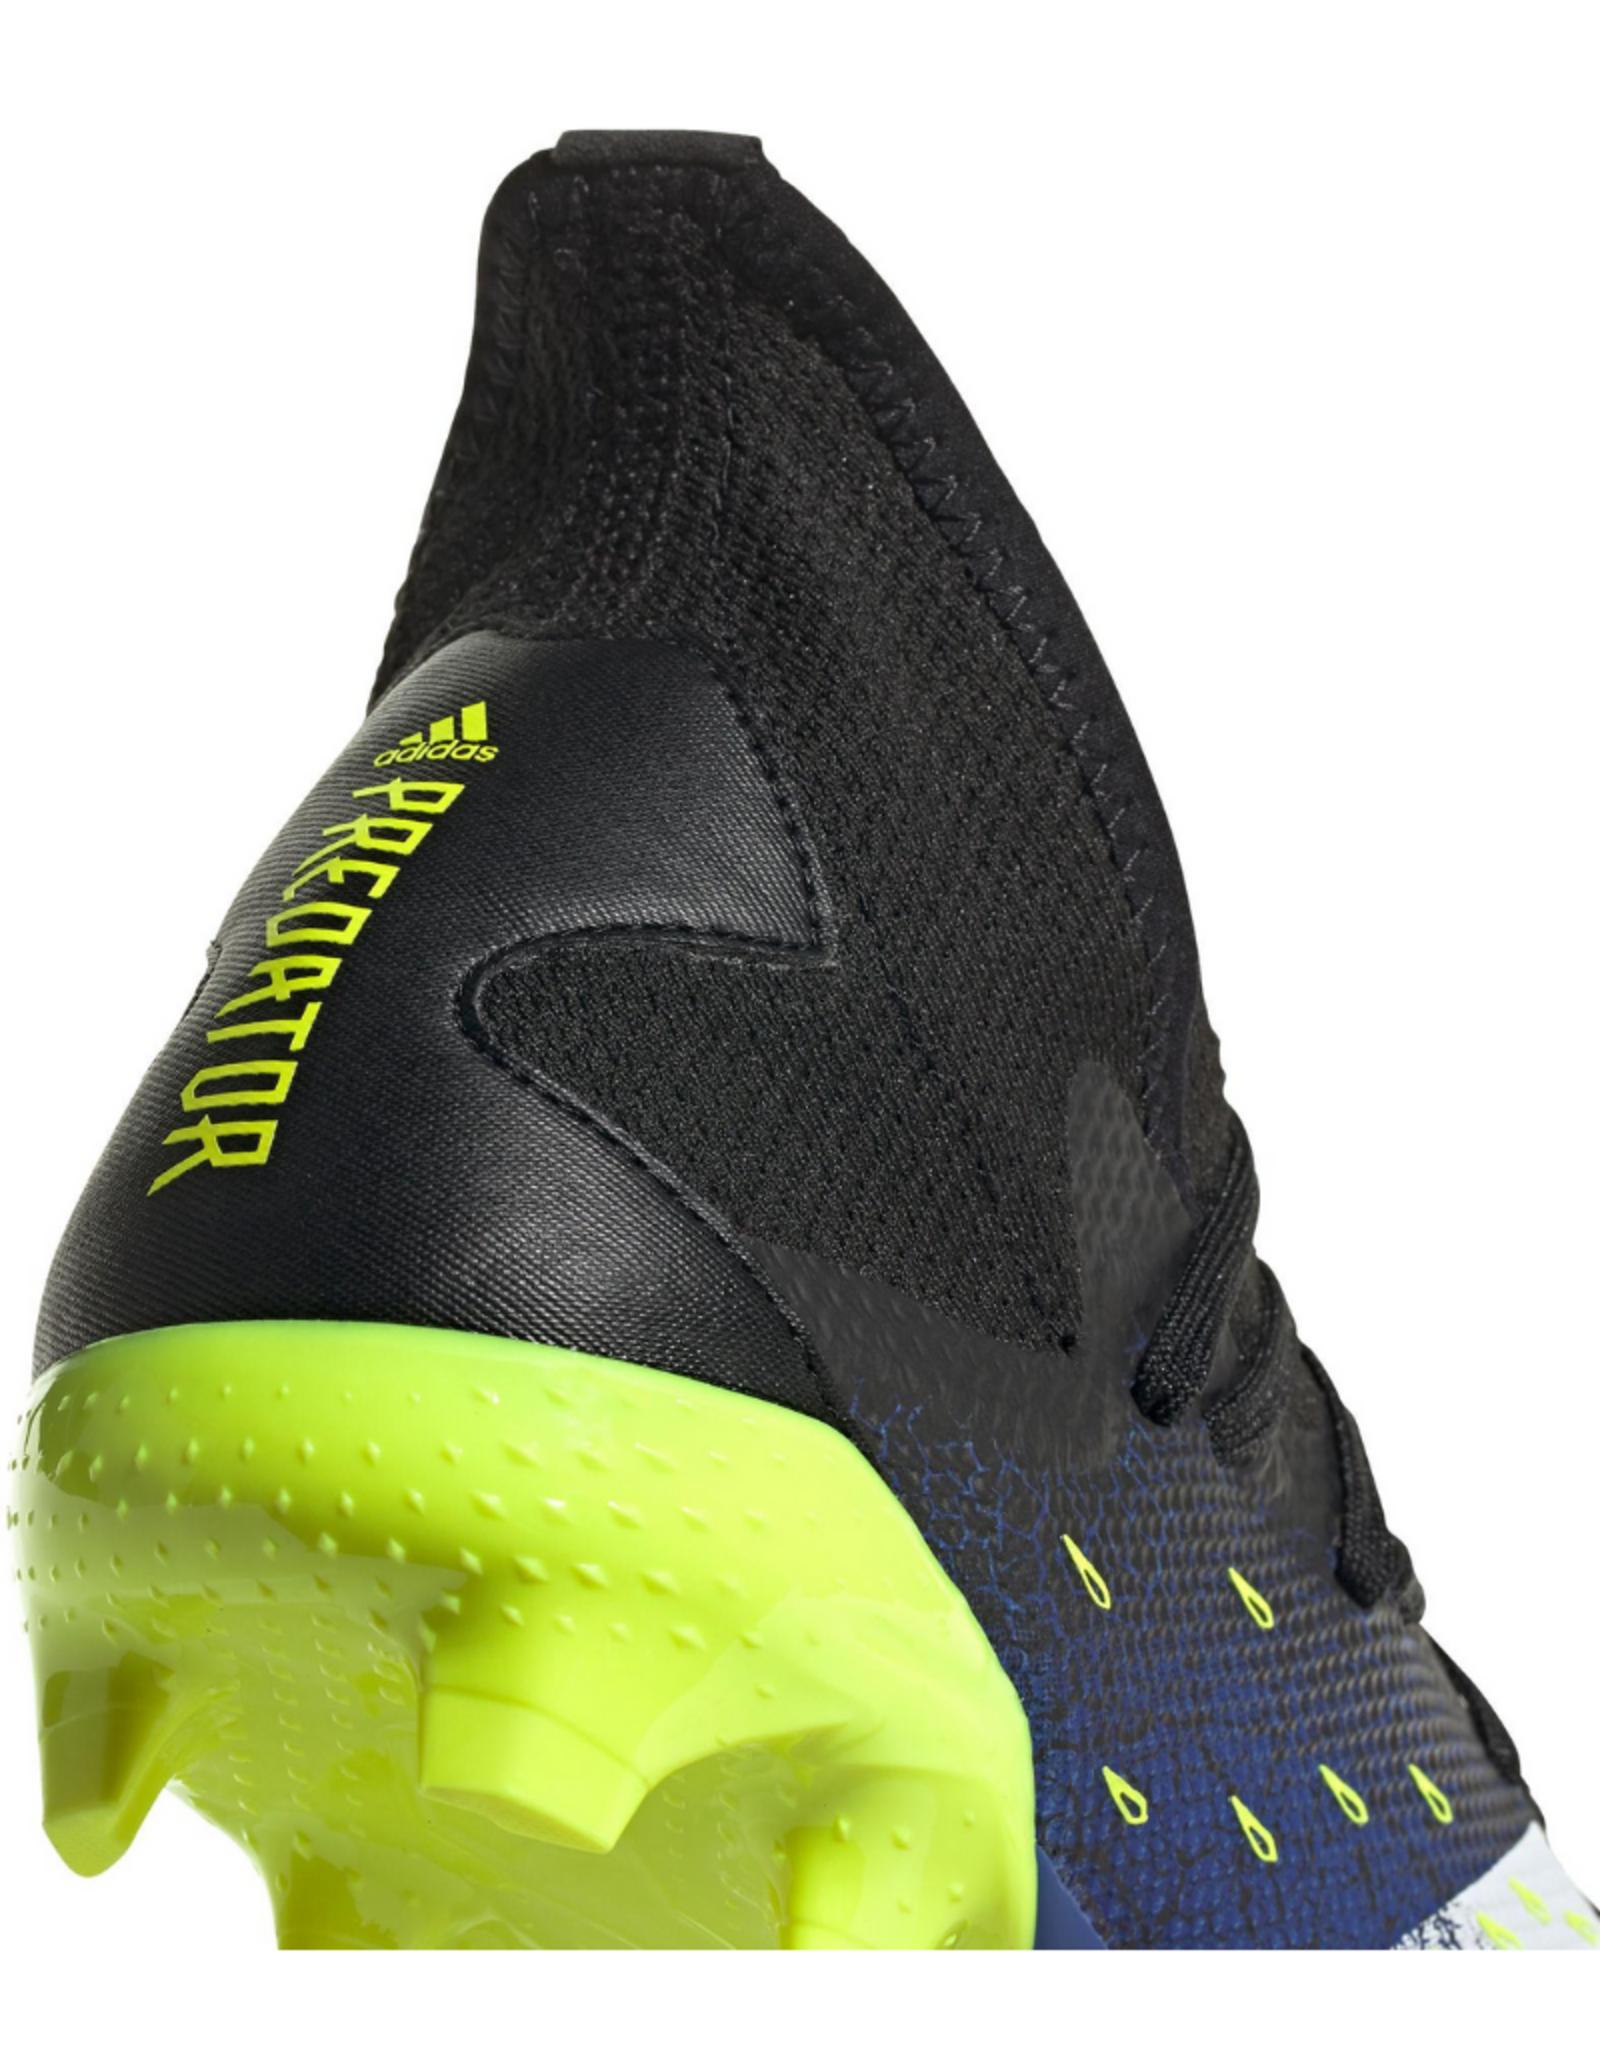 Adidas Adidas Predator Freak .3 Soccer Cleats Navy